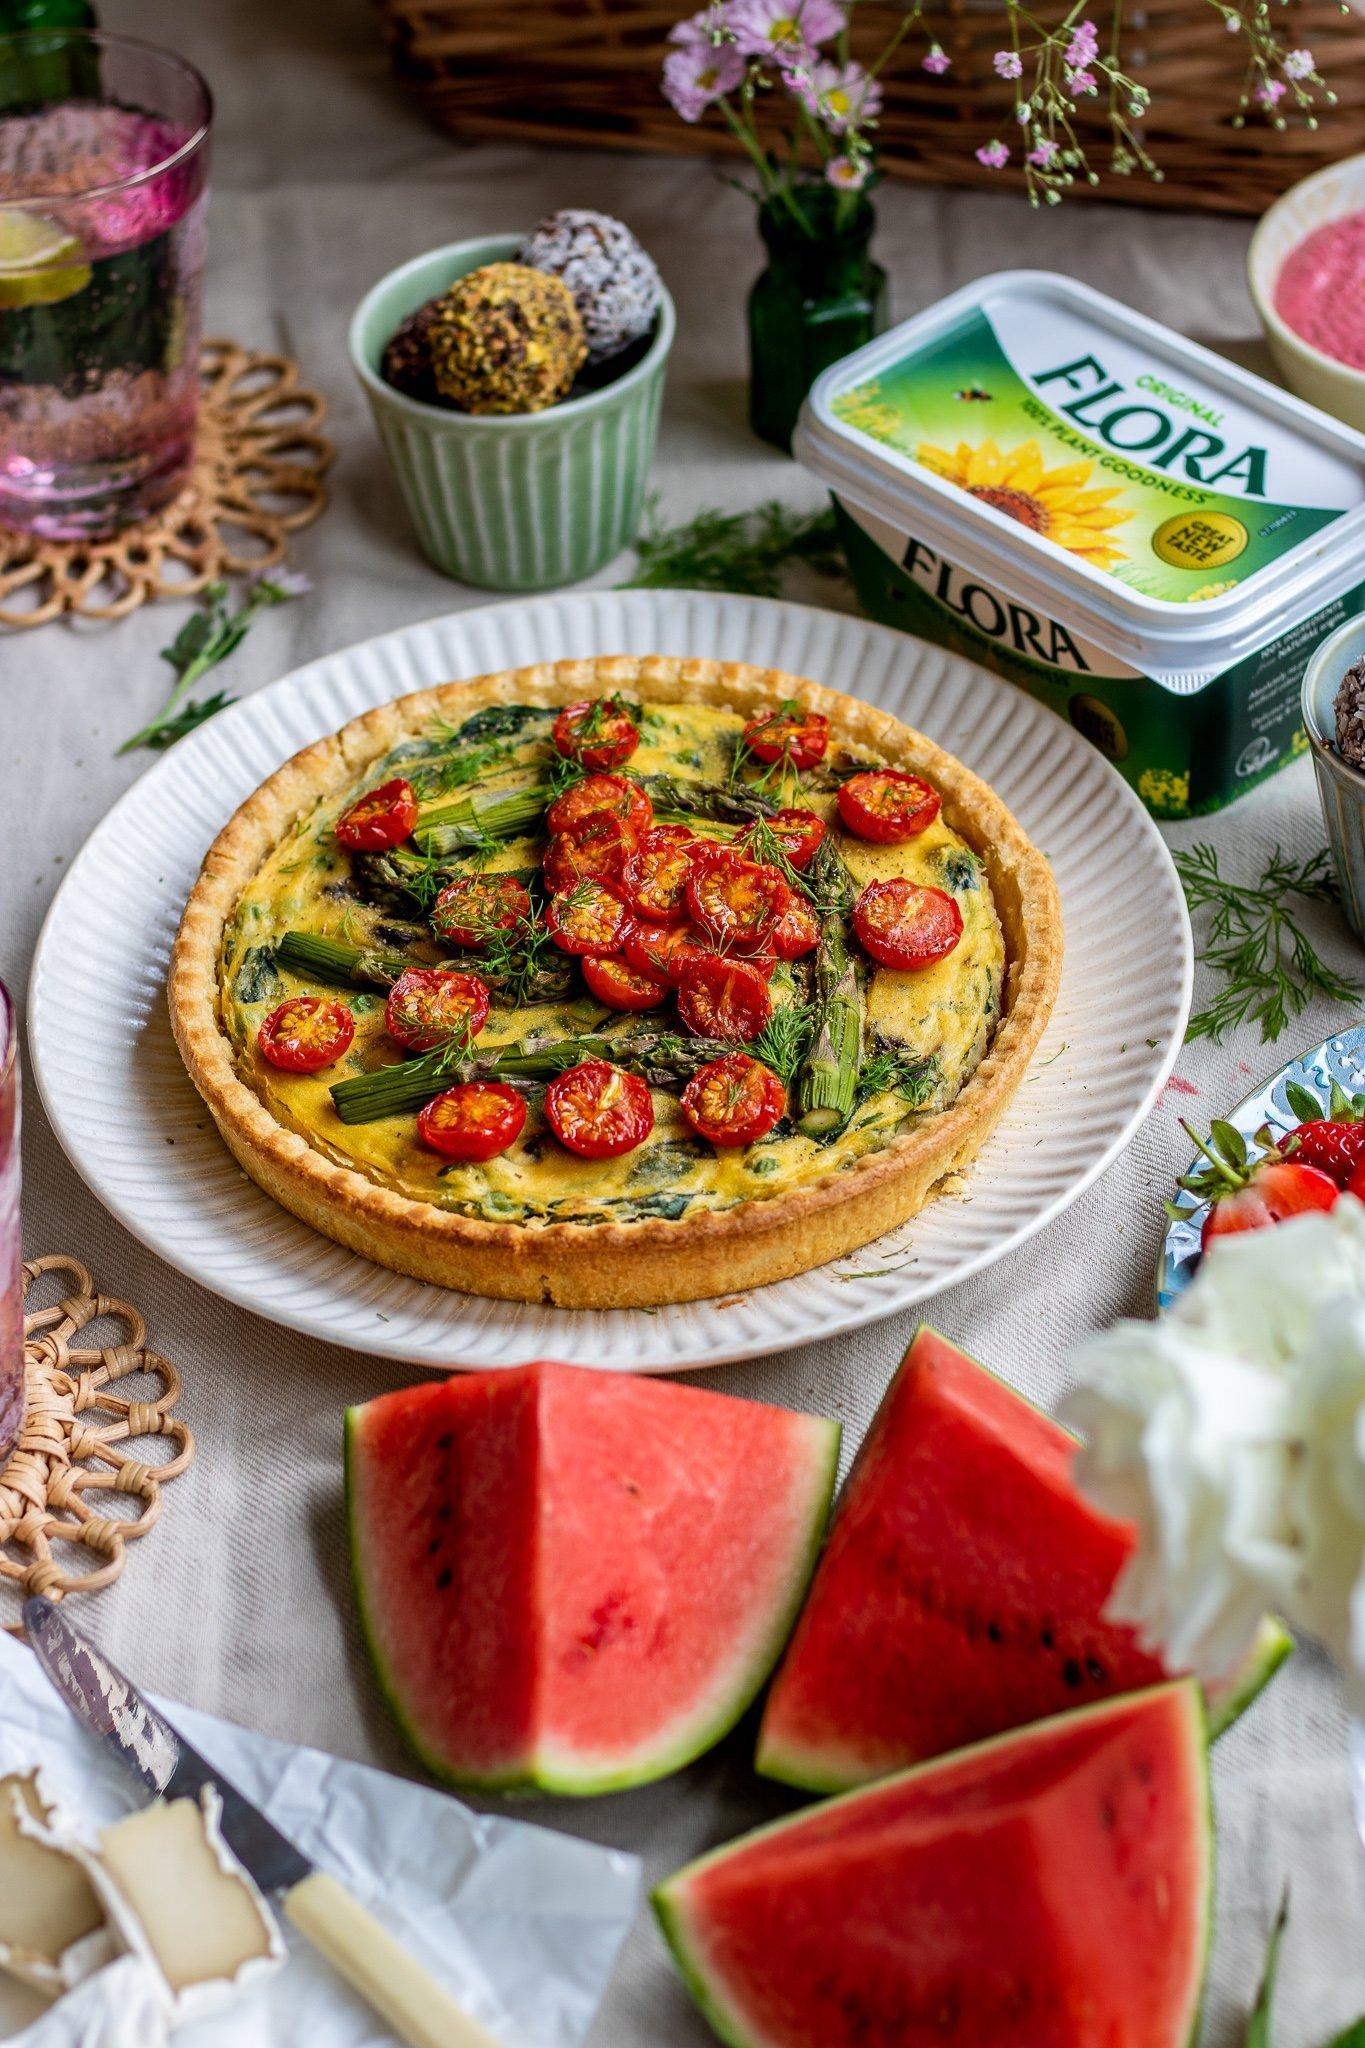 Asparagus & Pea Quiche